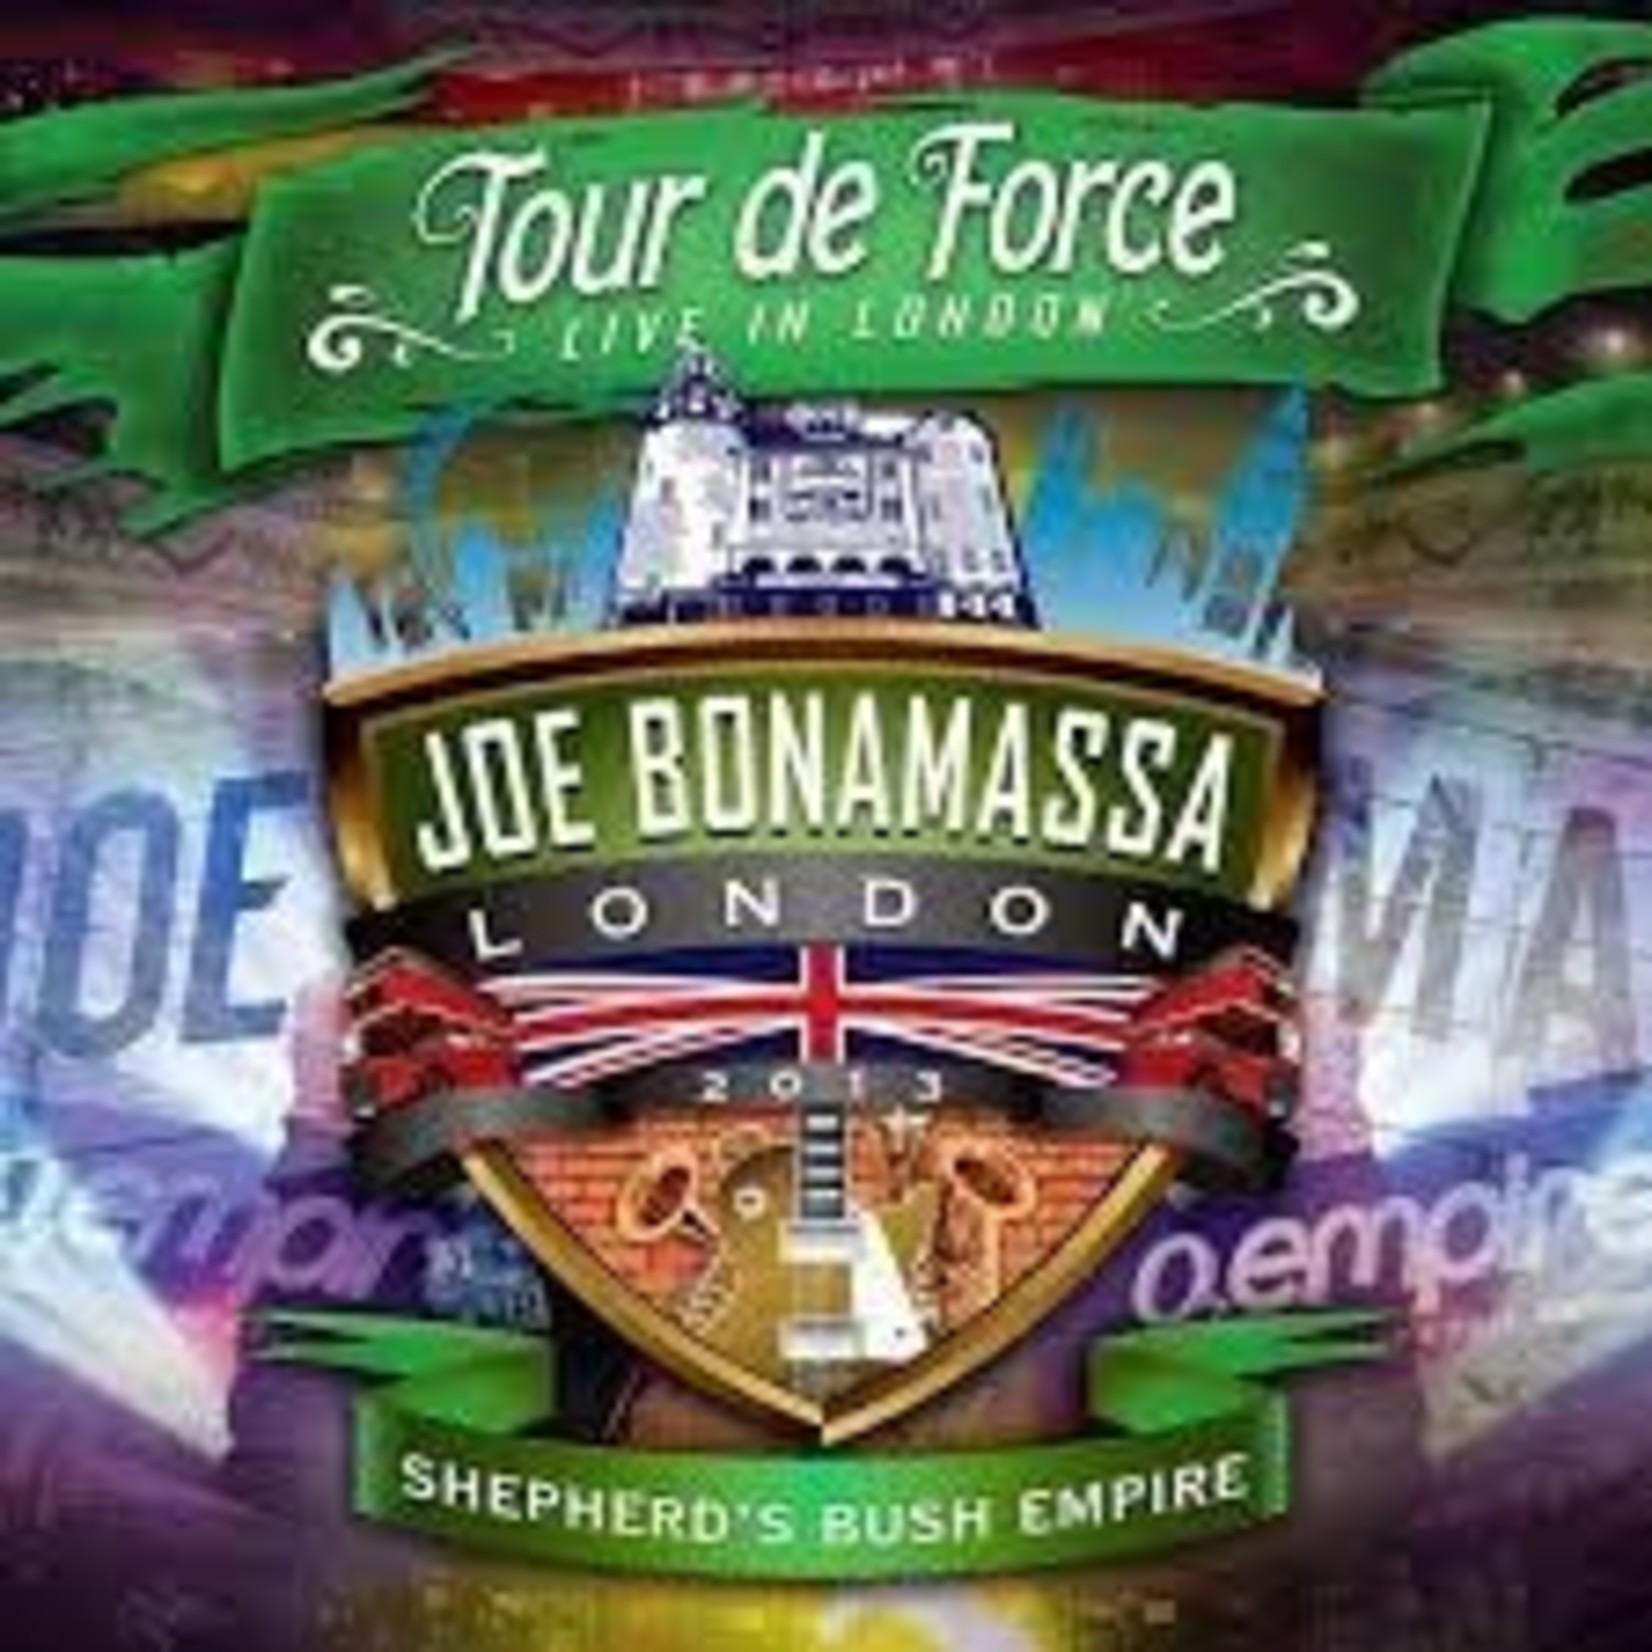 JOE BONAMASSA - TOUR DE FORCE - LIVE IN LONDON AT SHEPERD'S BUSH 3LP (VINYL)